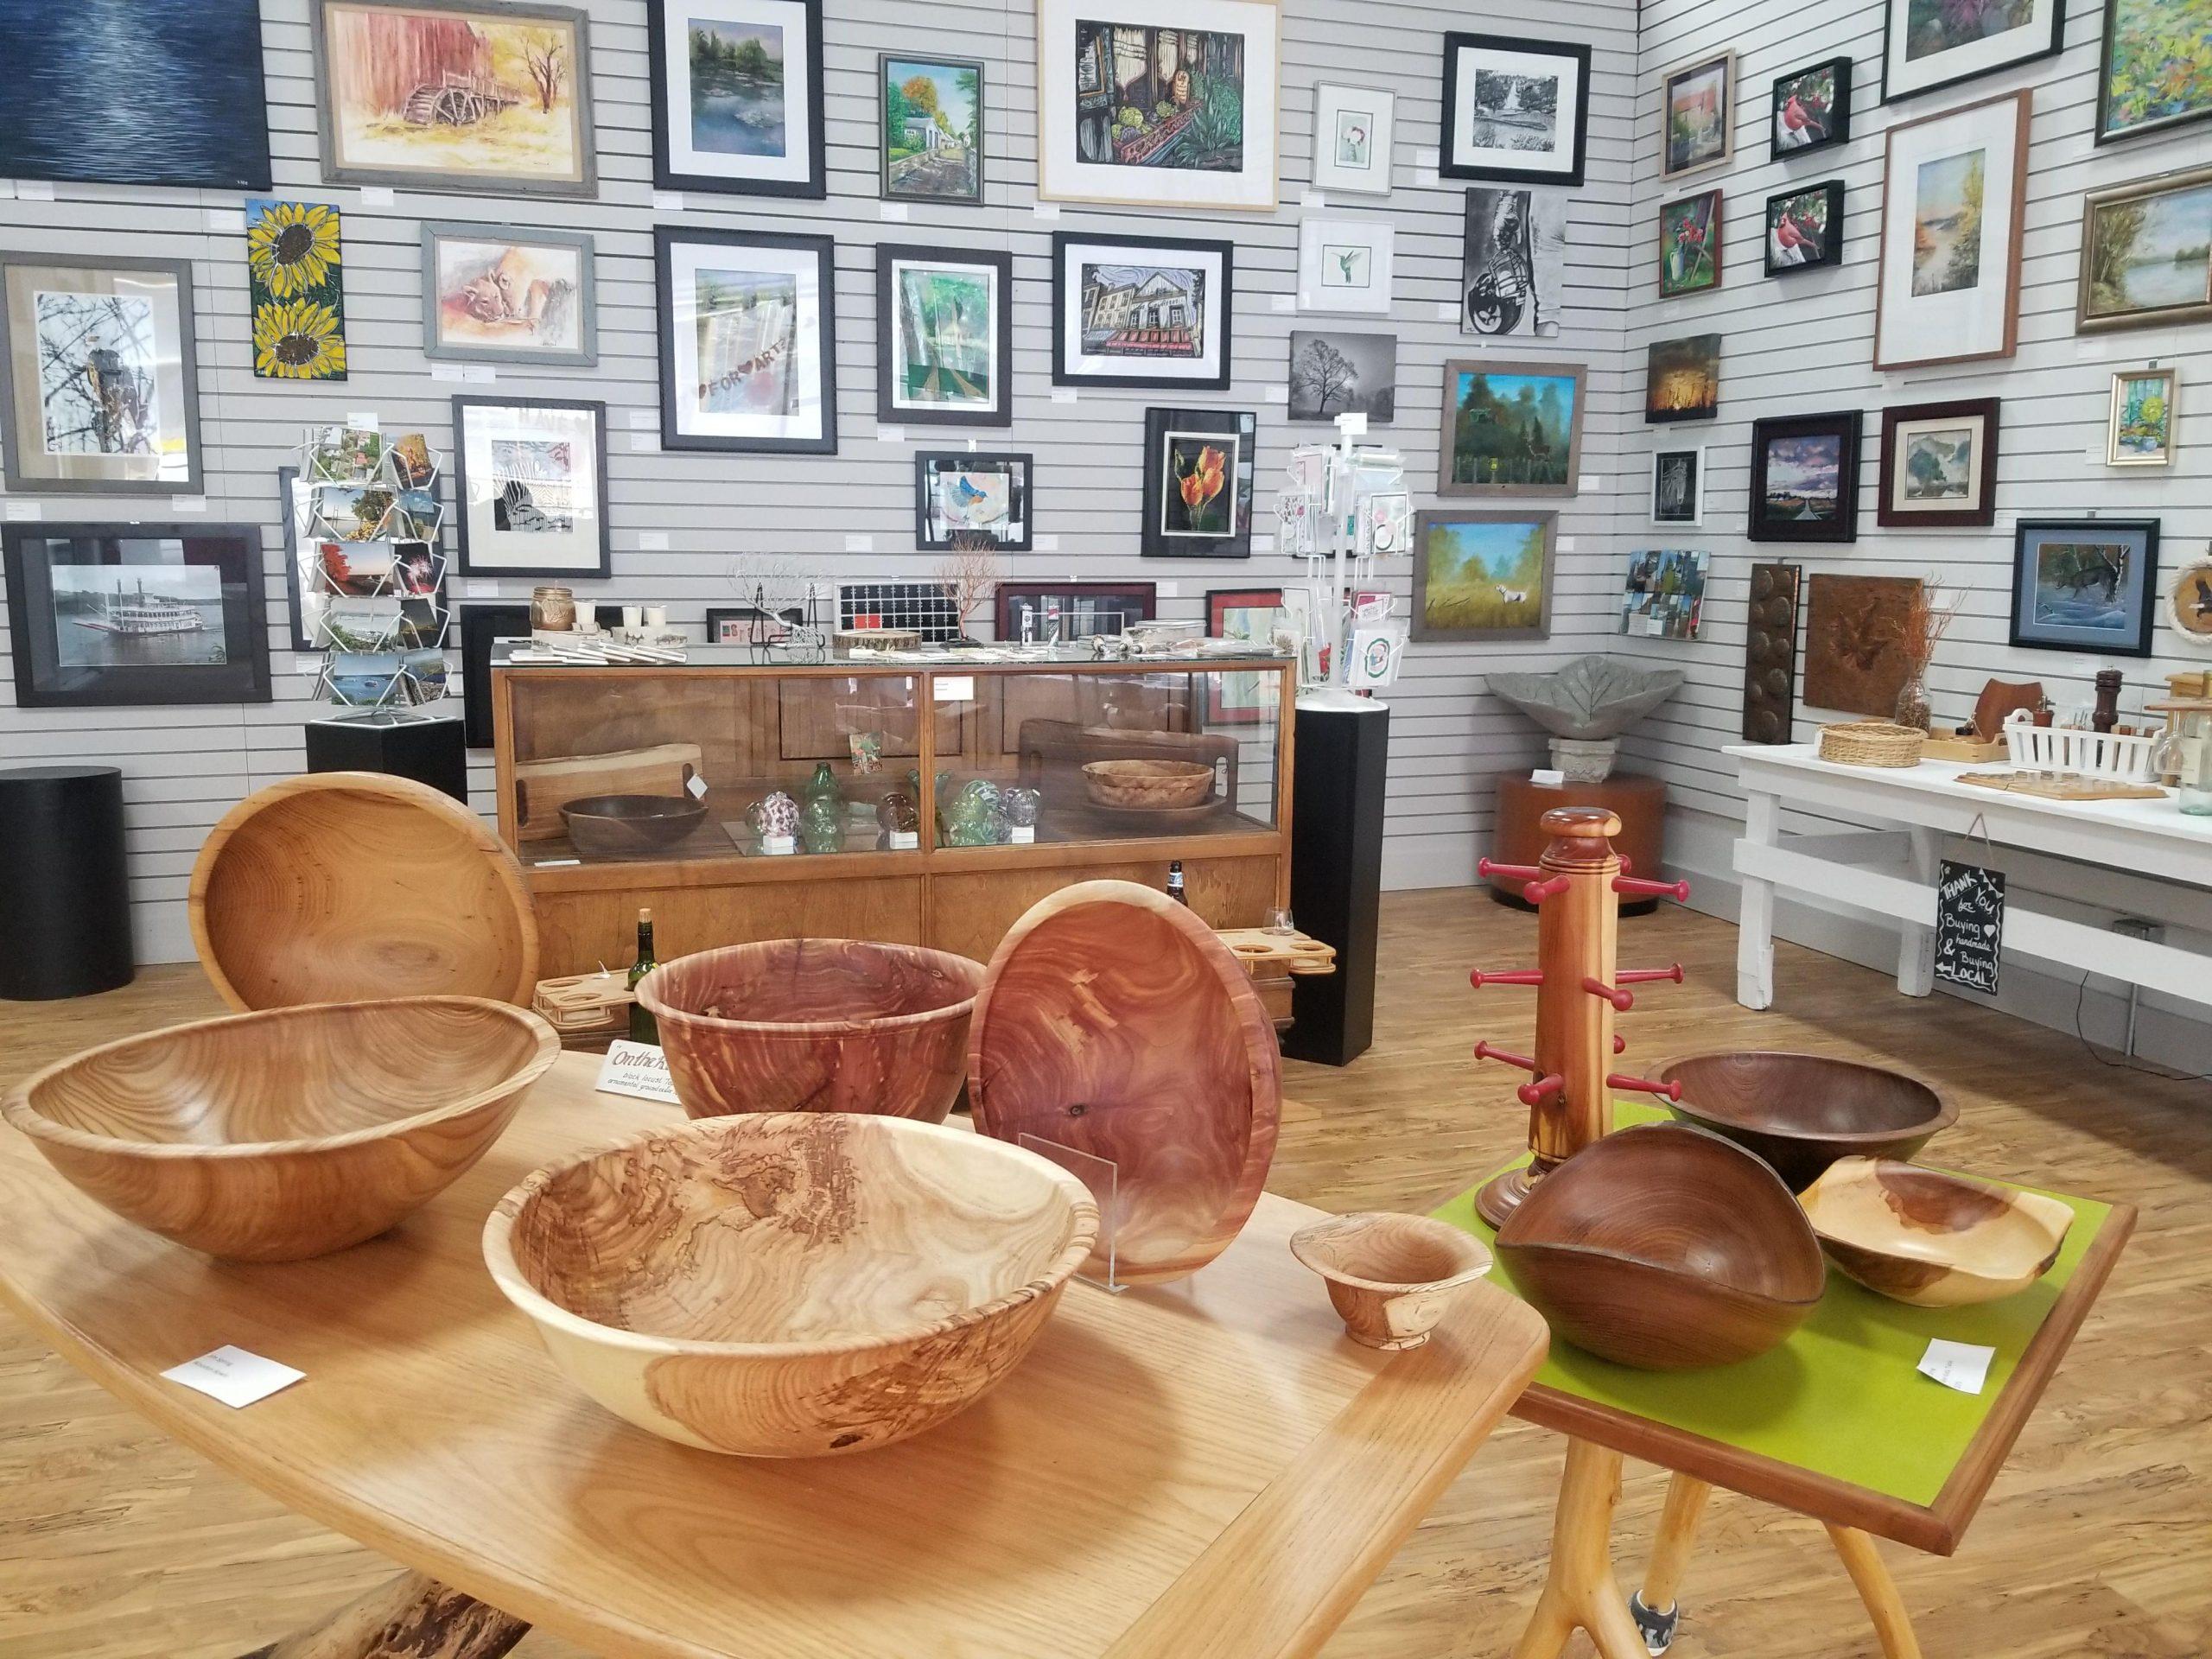 The Art Center of Burlington